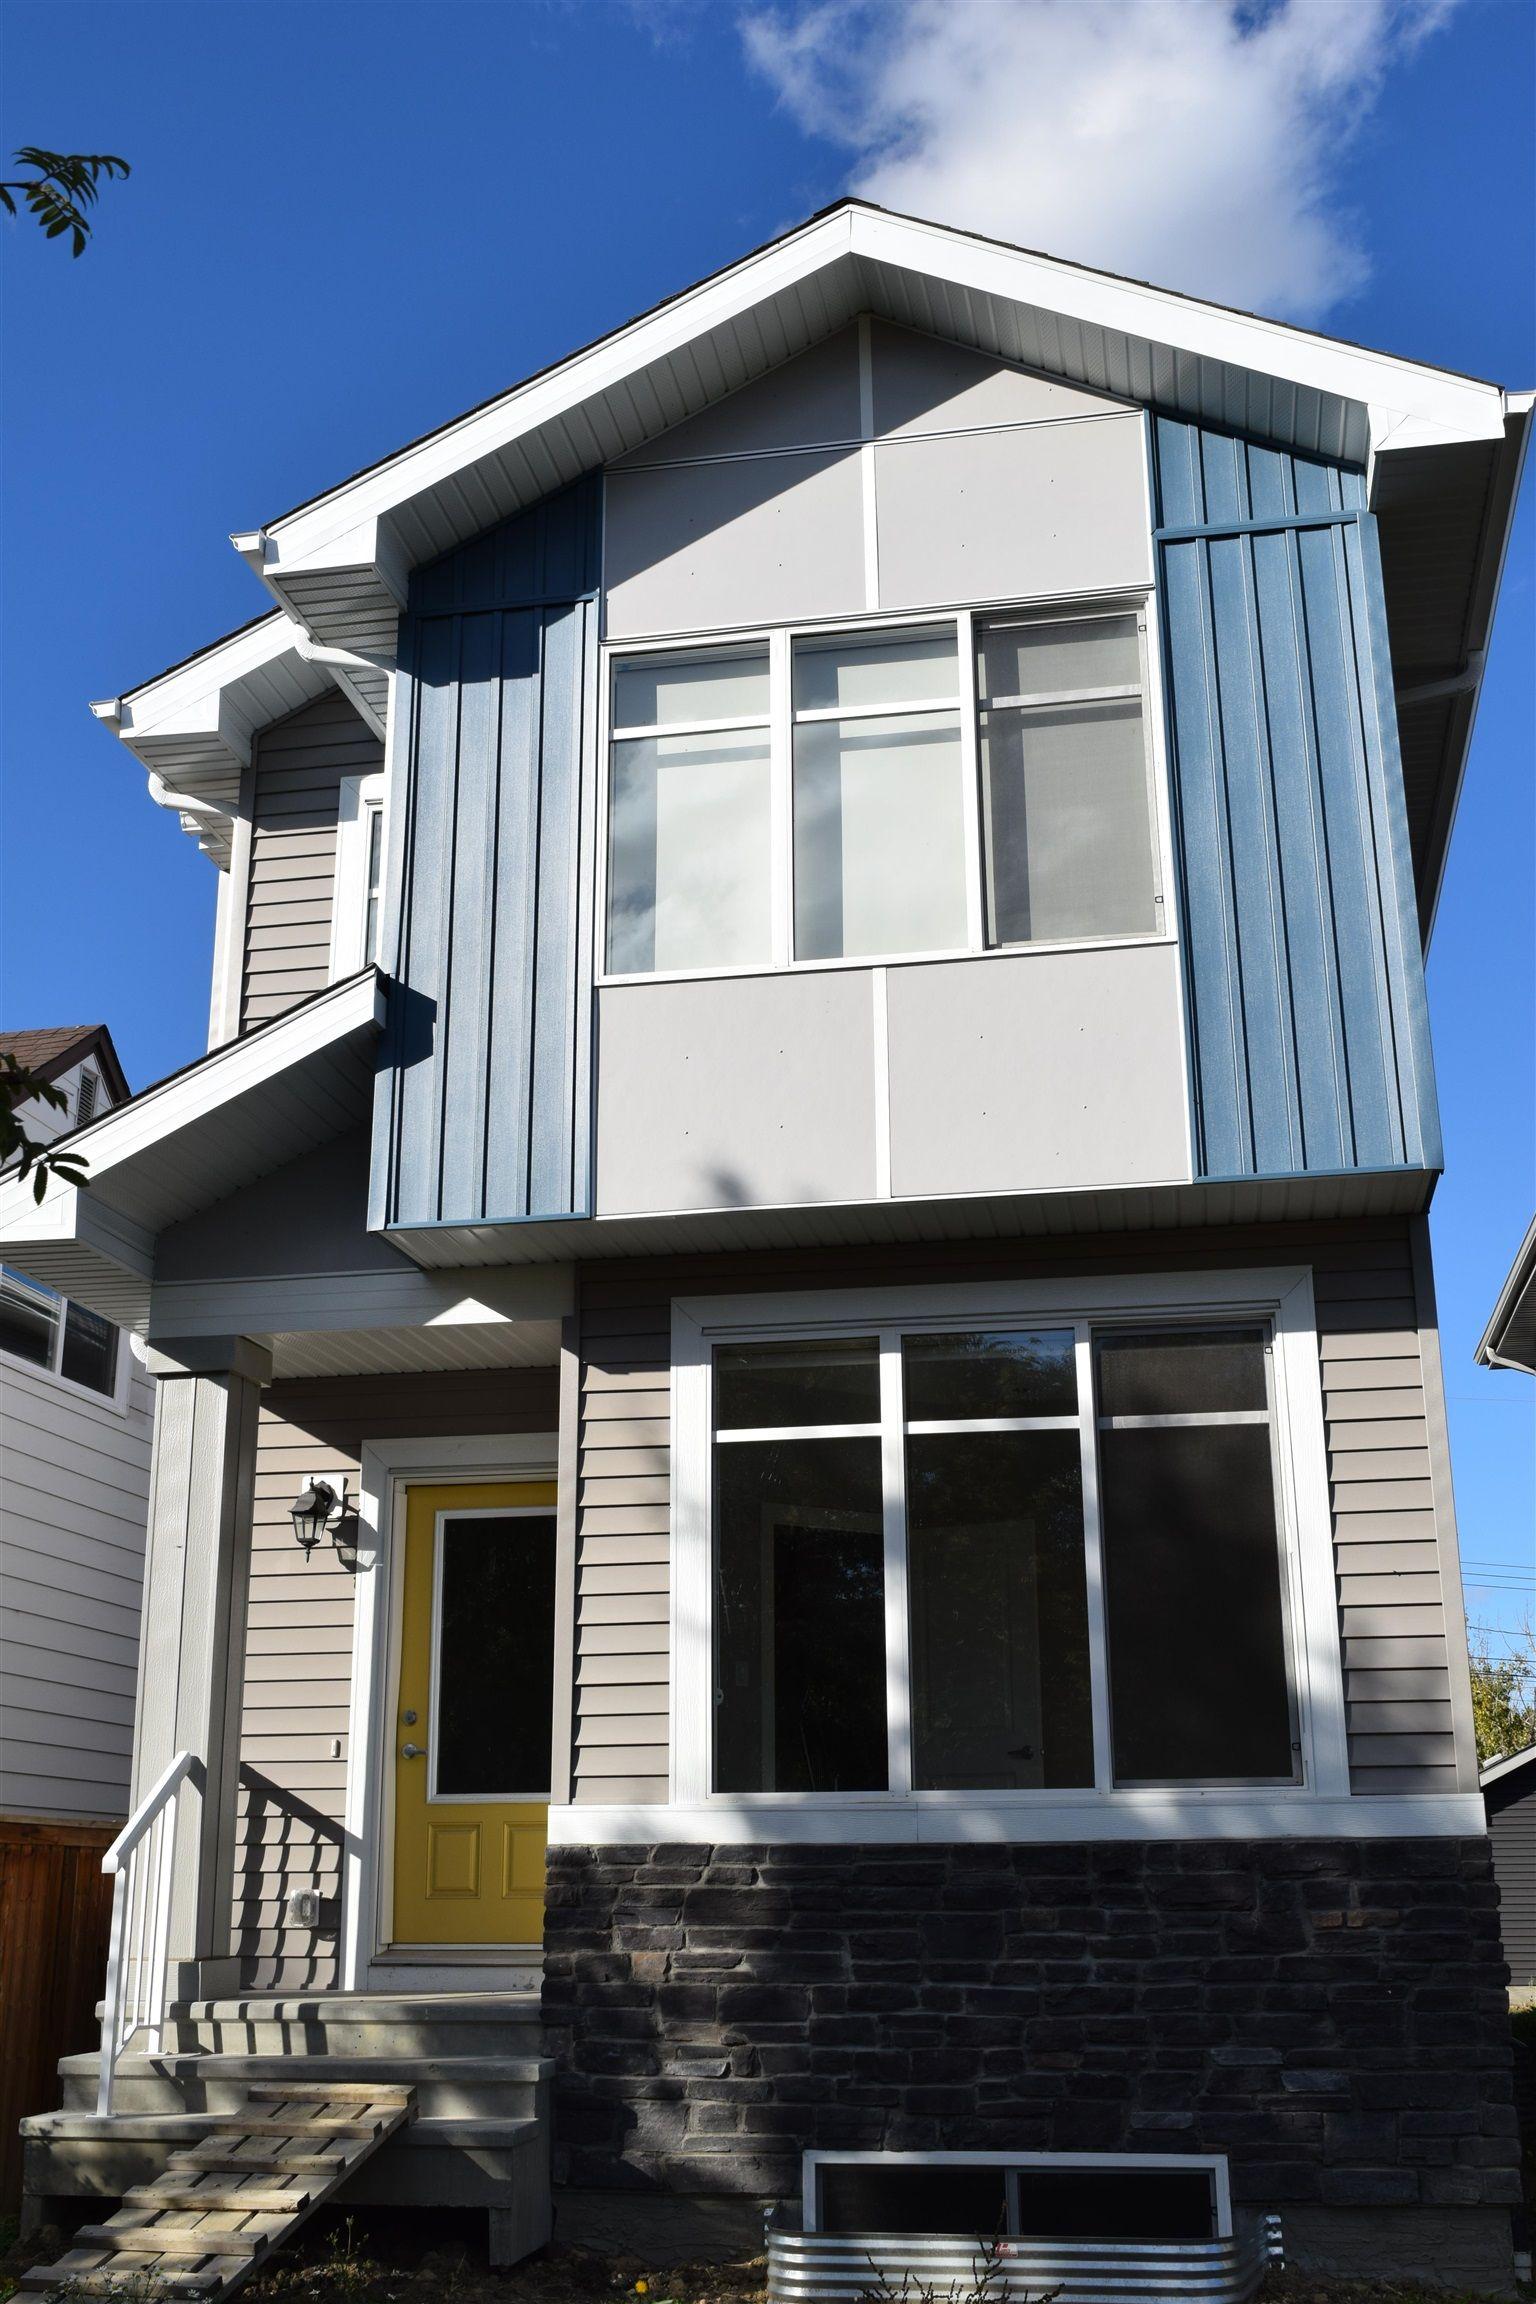 Main Photo: 9118 66 Avenue in Edmonton: Zone 17 House for sale : MLS®# E4264017